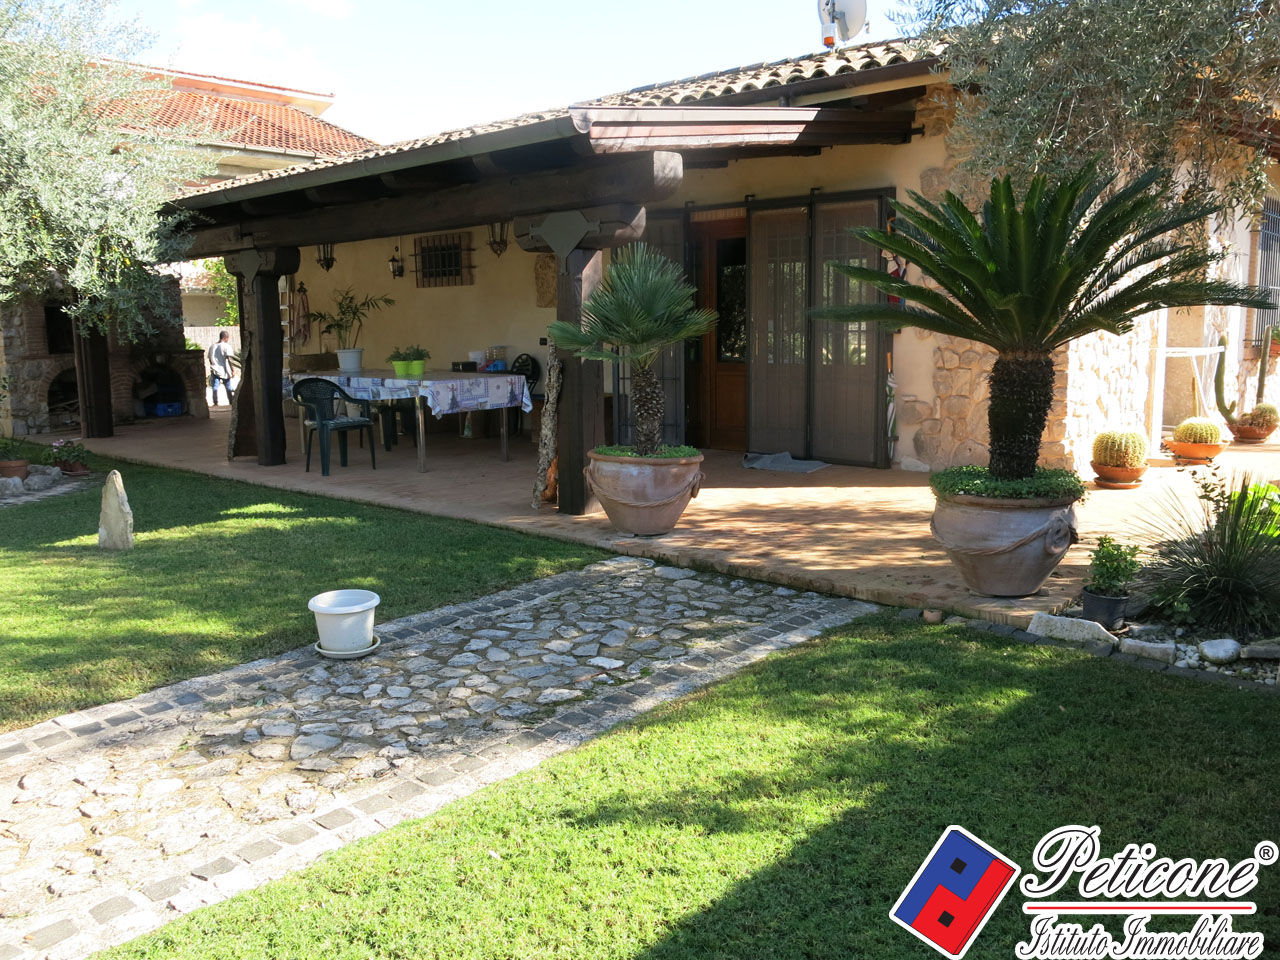 Villa in Vendita a Fondi: 3 locali, 107 mq - Foto 1